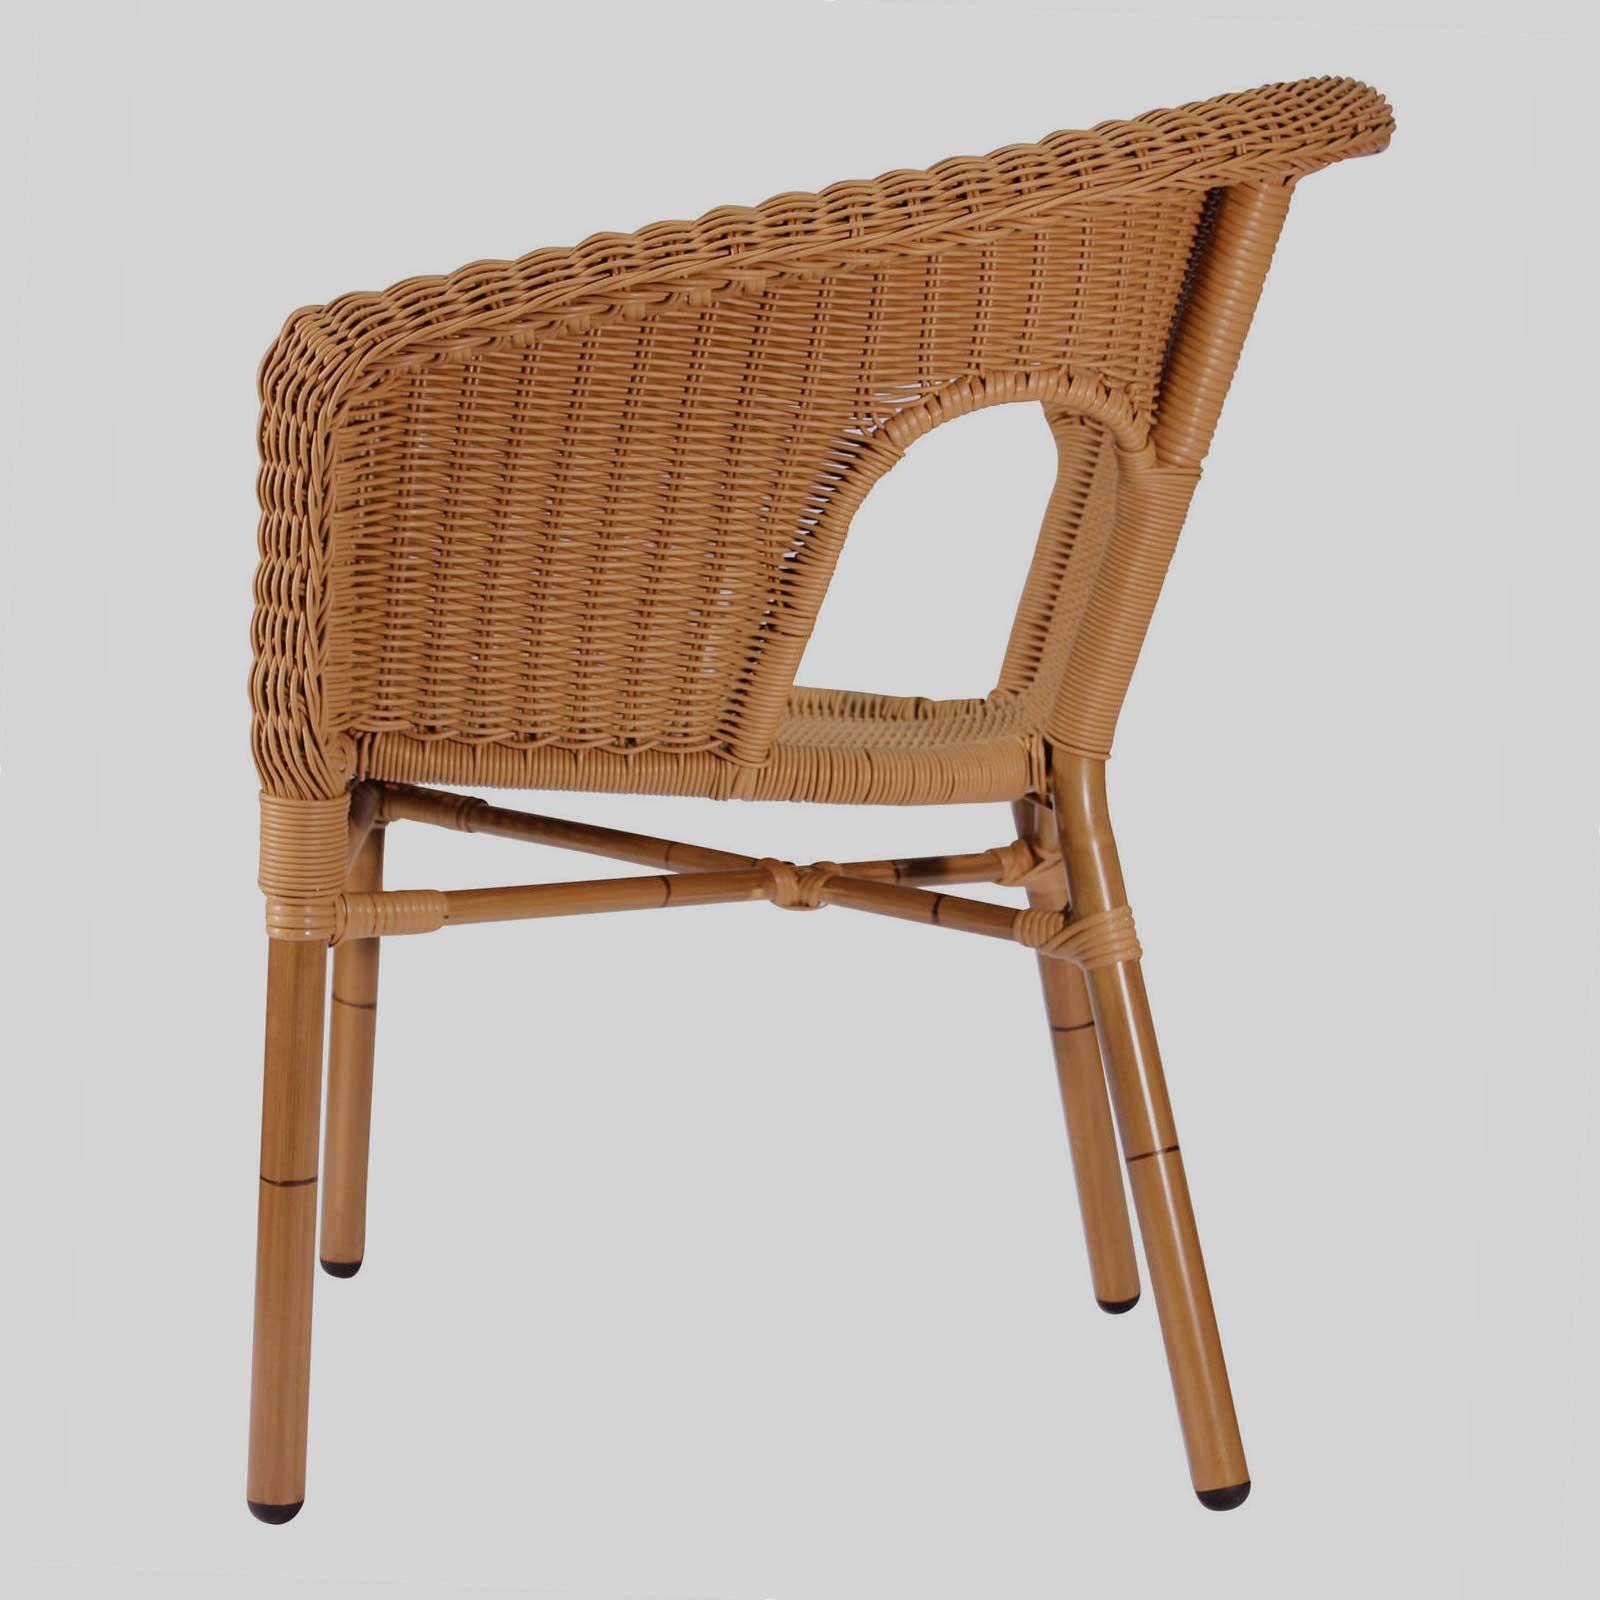 Outdoor Wicker Chairs Brazil